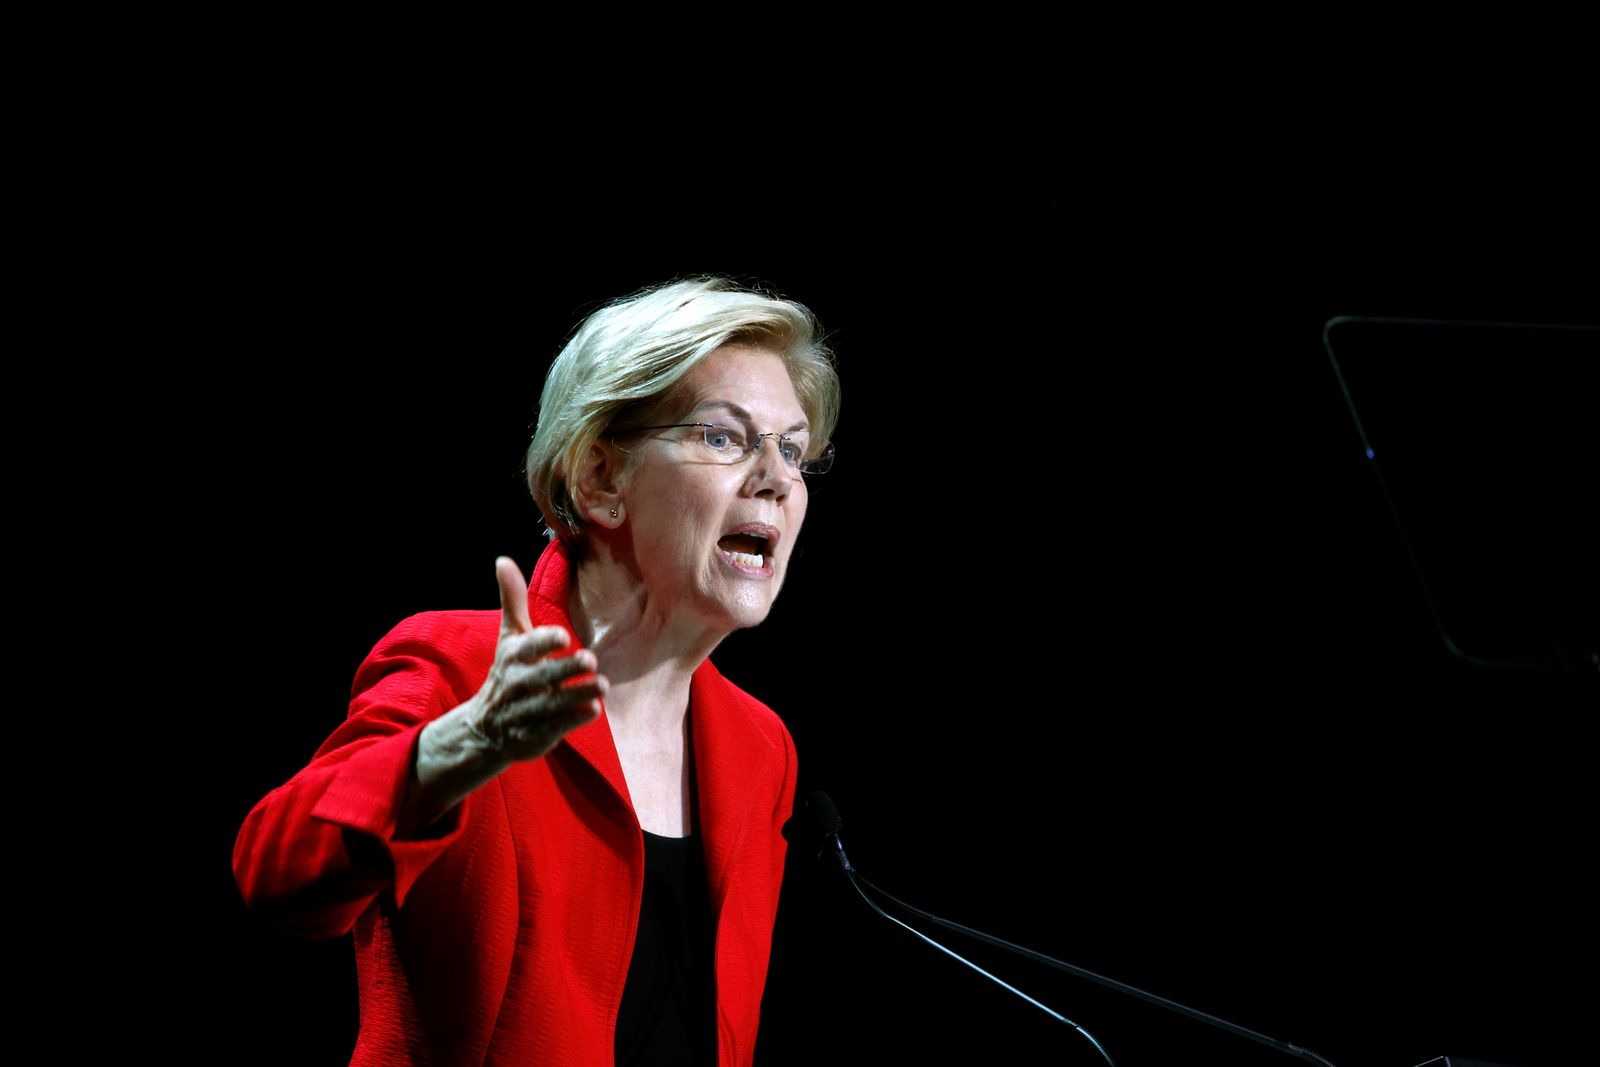 Democratic presidential candidate and U.S. Senator Elizabeth Warren (D-MA) speaks during the California Democratic Convention in San Francisco